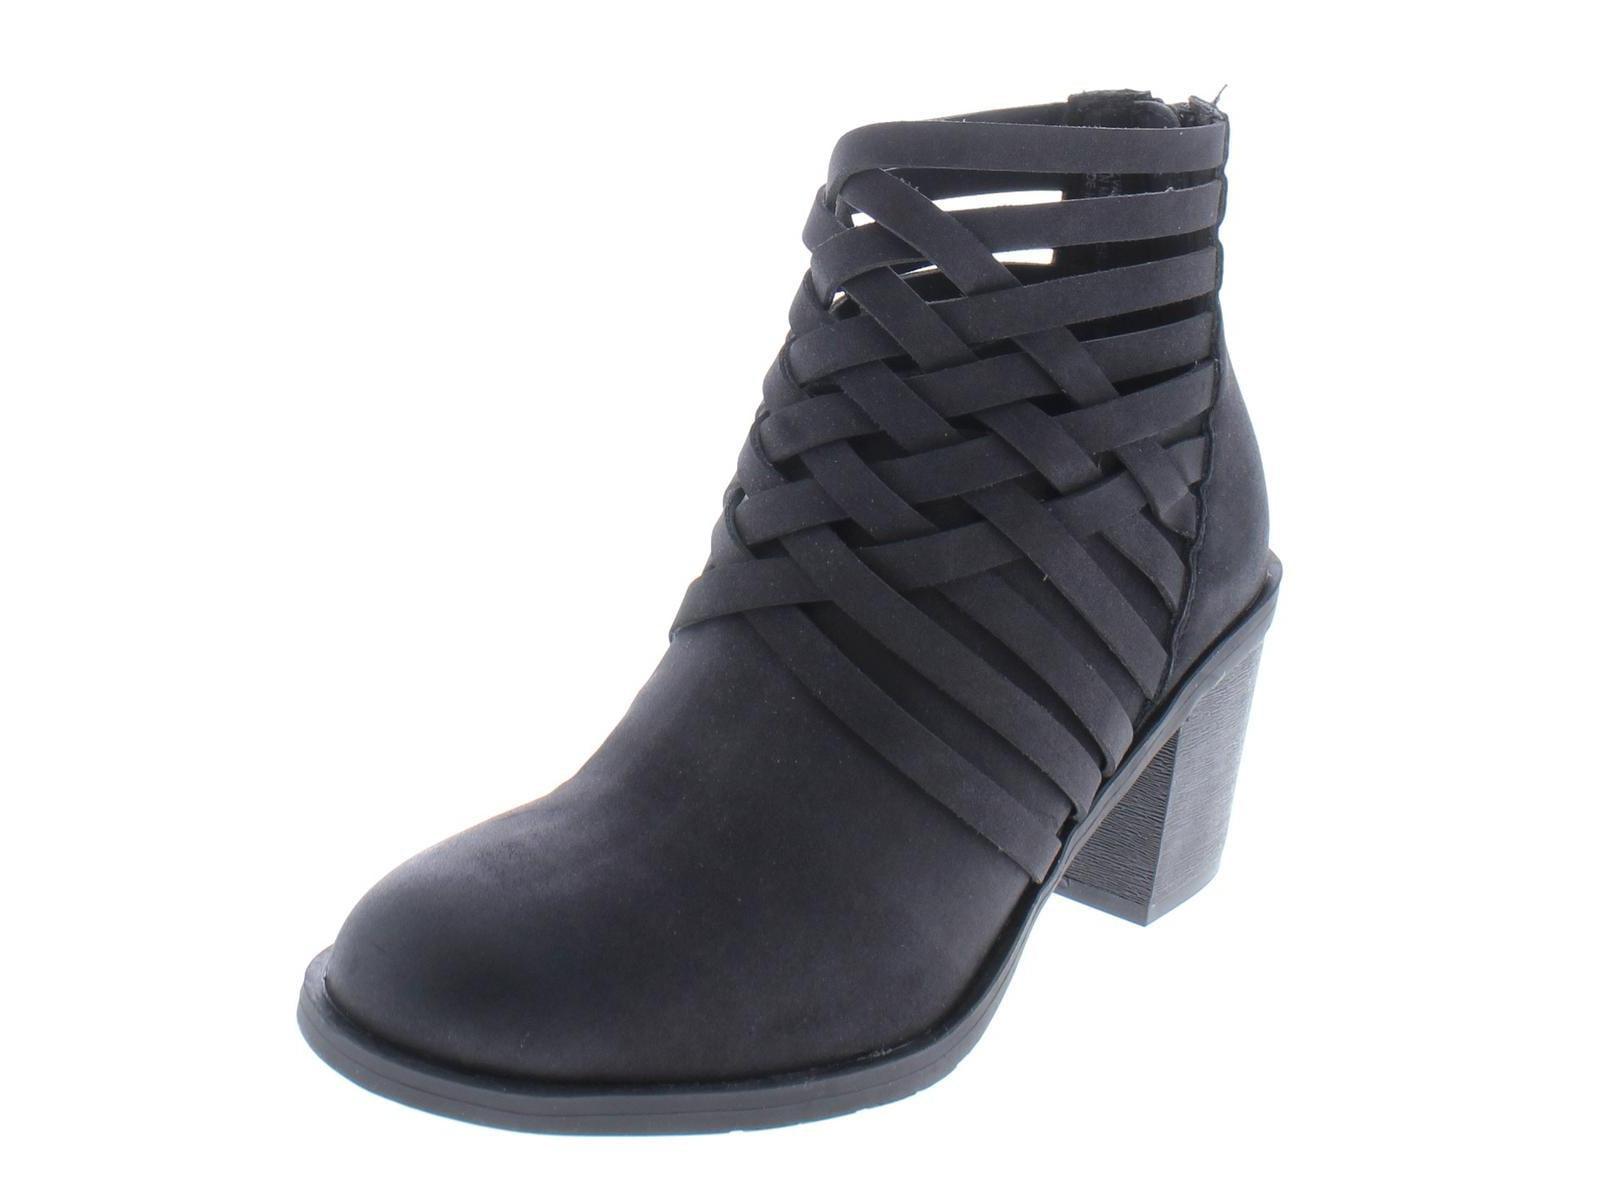 5ed5e7cb194 American Rag Womens Varya Closed Toe Ankle Fashion Boots